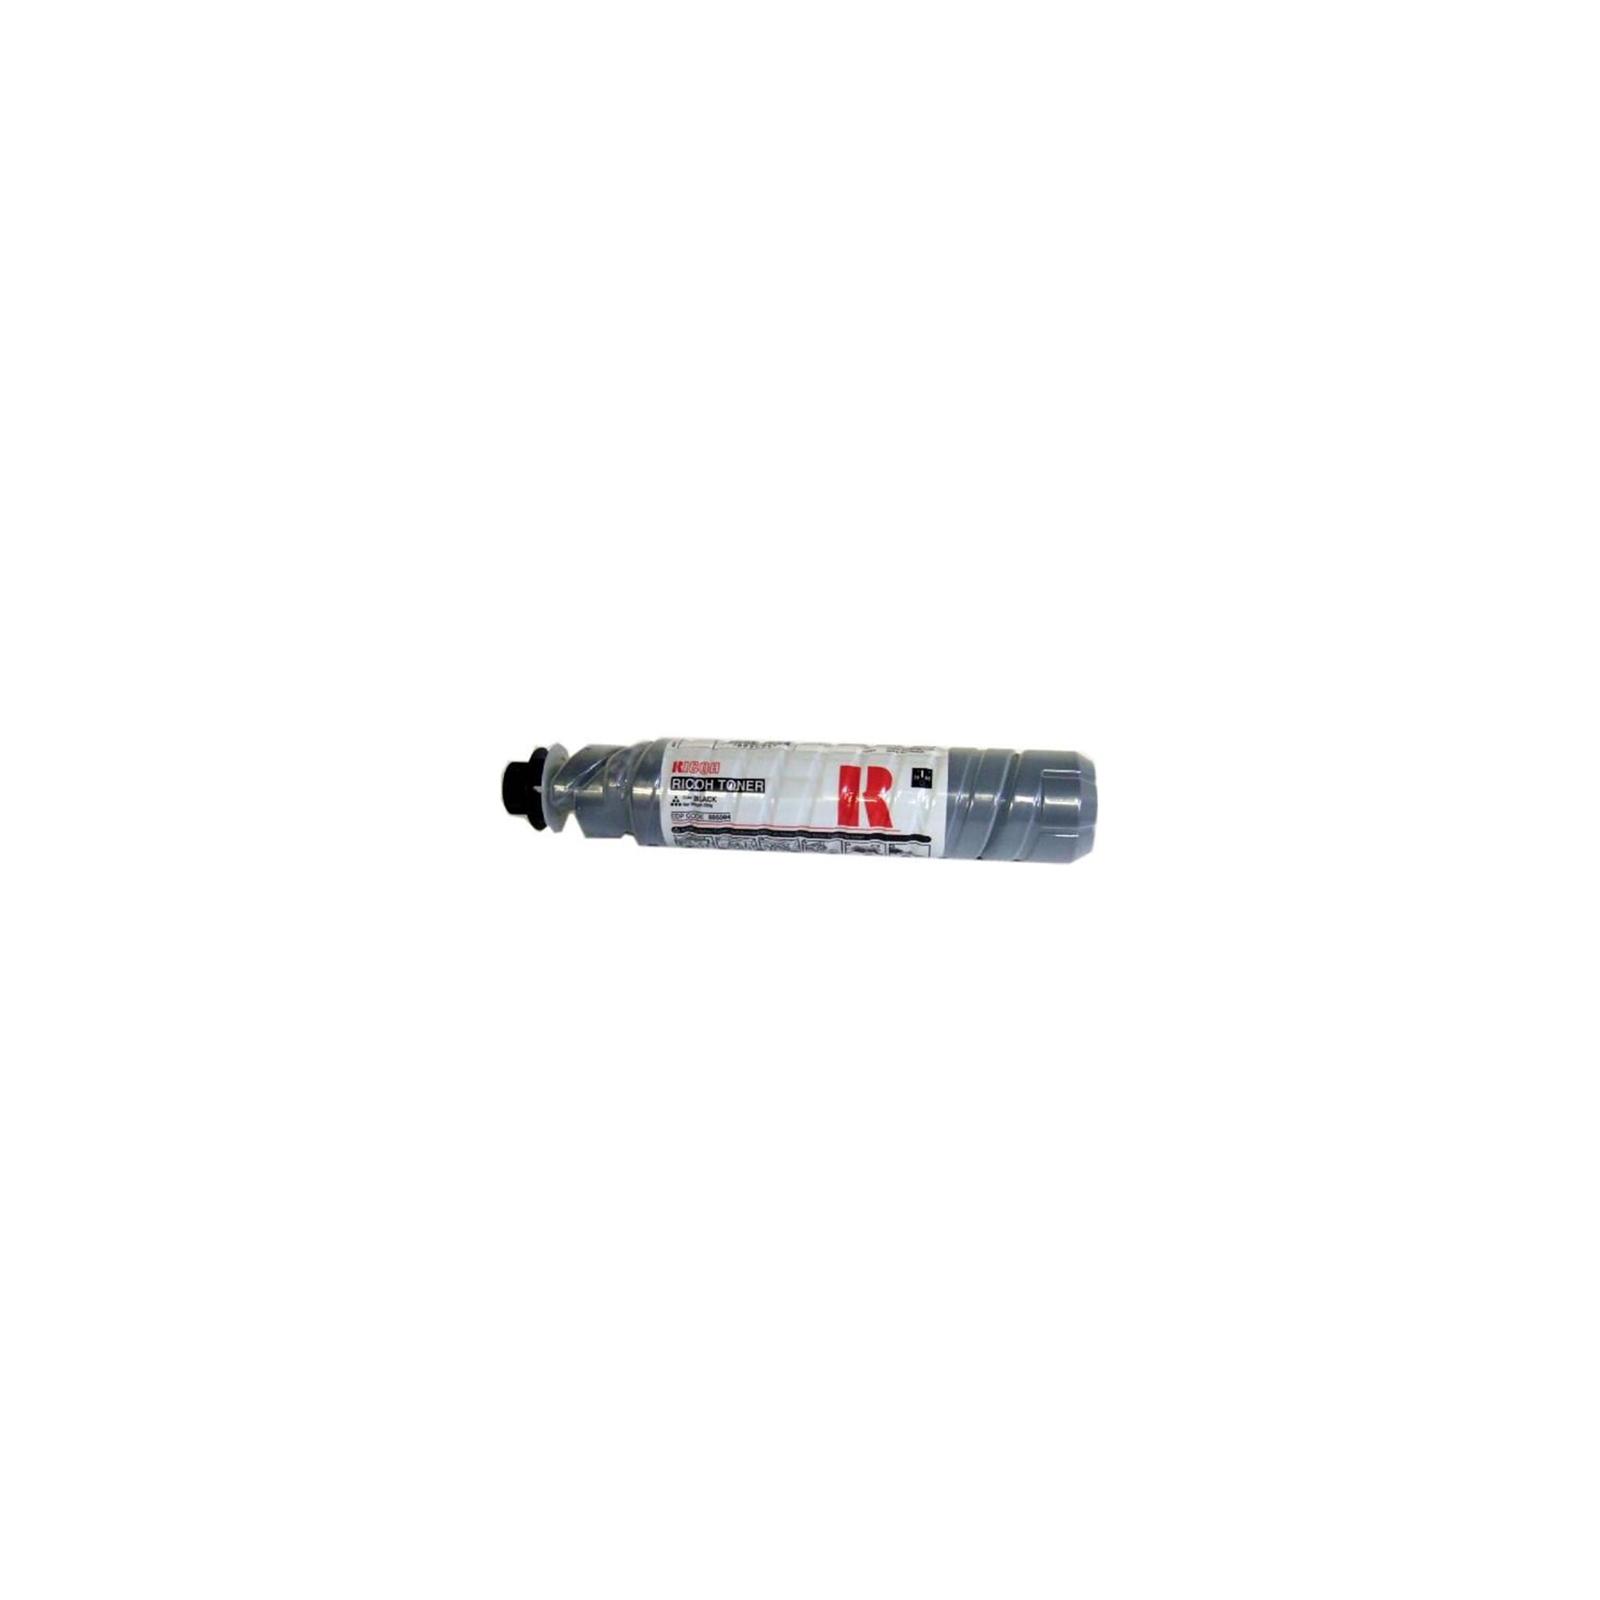 Тонер-картридж Ricoh TOMP4500EFR2 Black 30К (MP3500/MP4000/MP4500/MP5000/MP4001) (841347) изображение 2